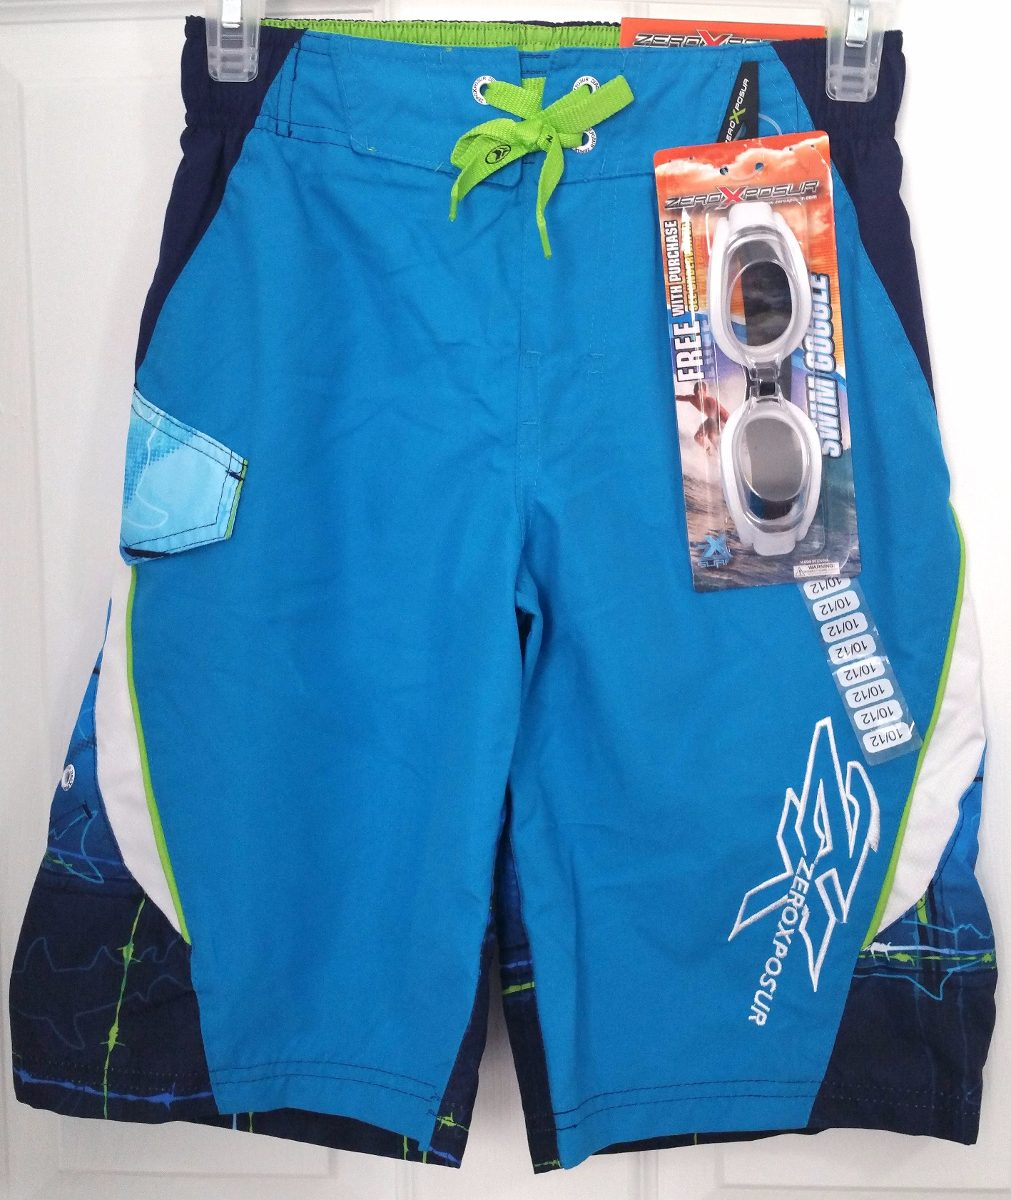 zeroxposur ropa de baño - surf short c upf50+ nuevo. Cargando zoom. f84f0e9be9d